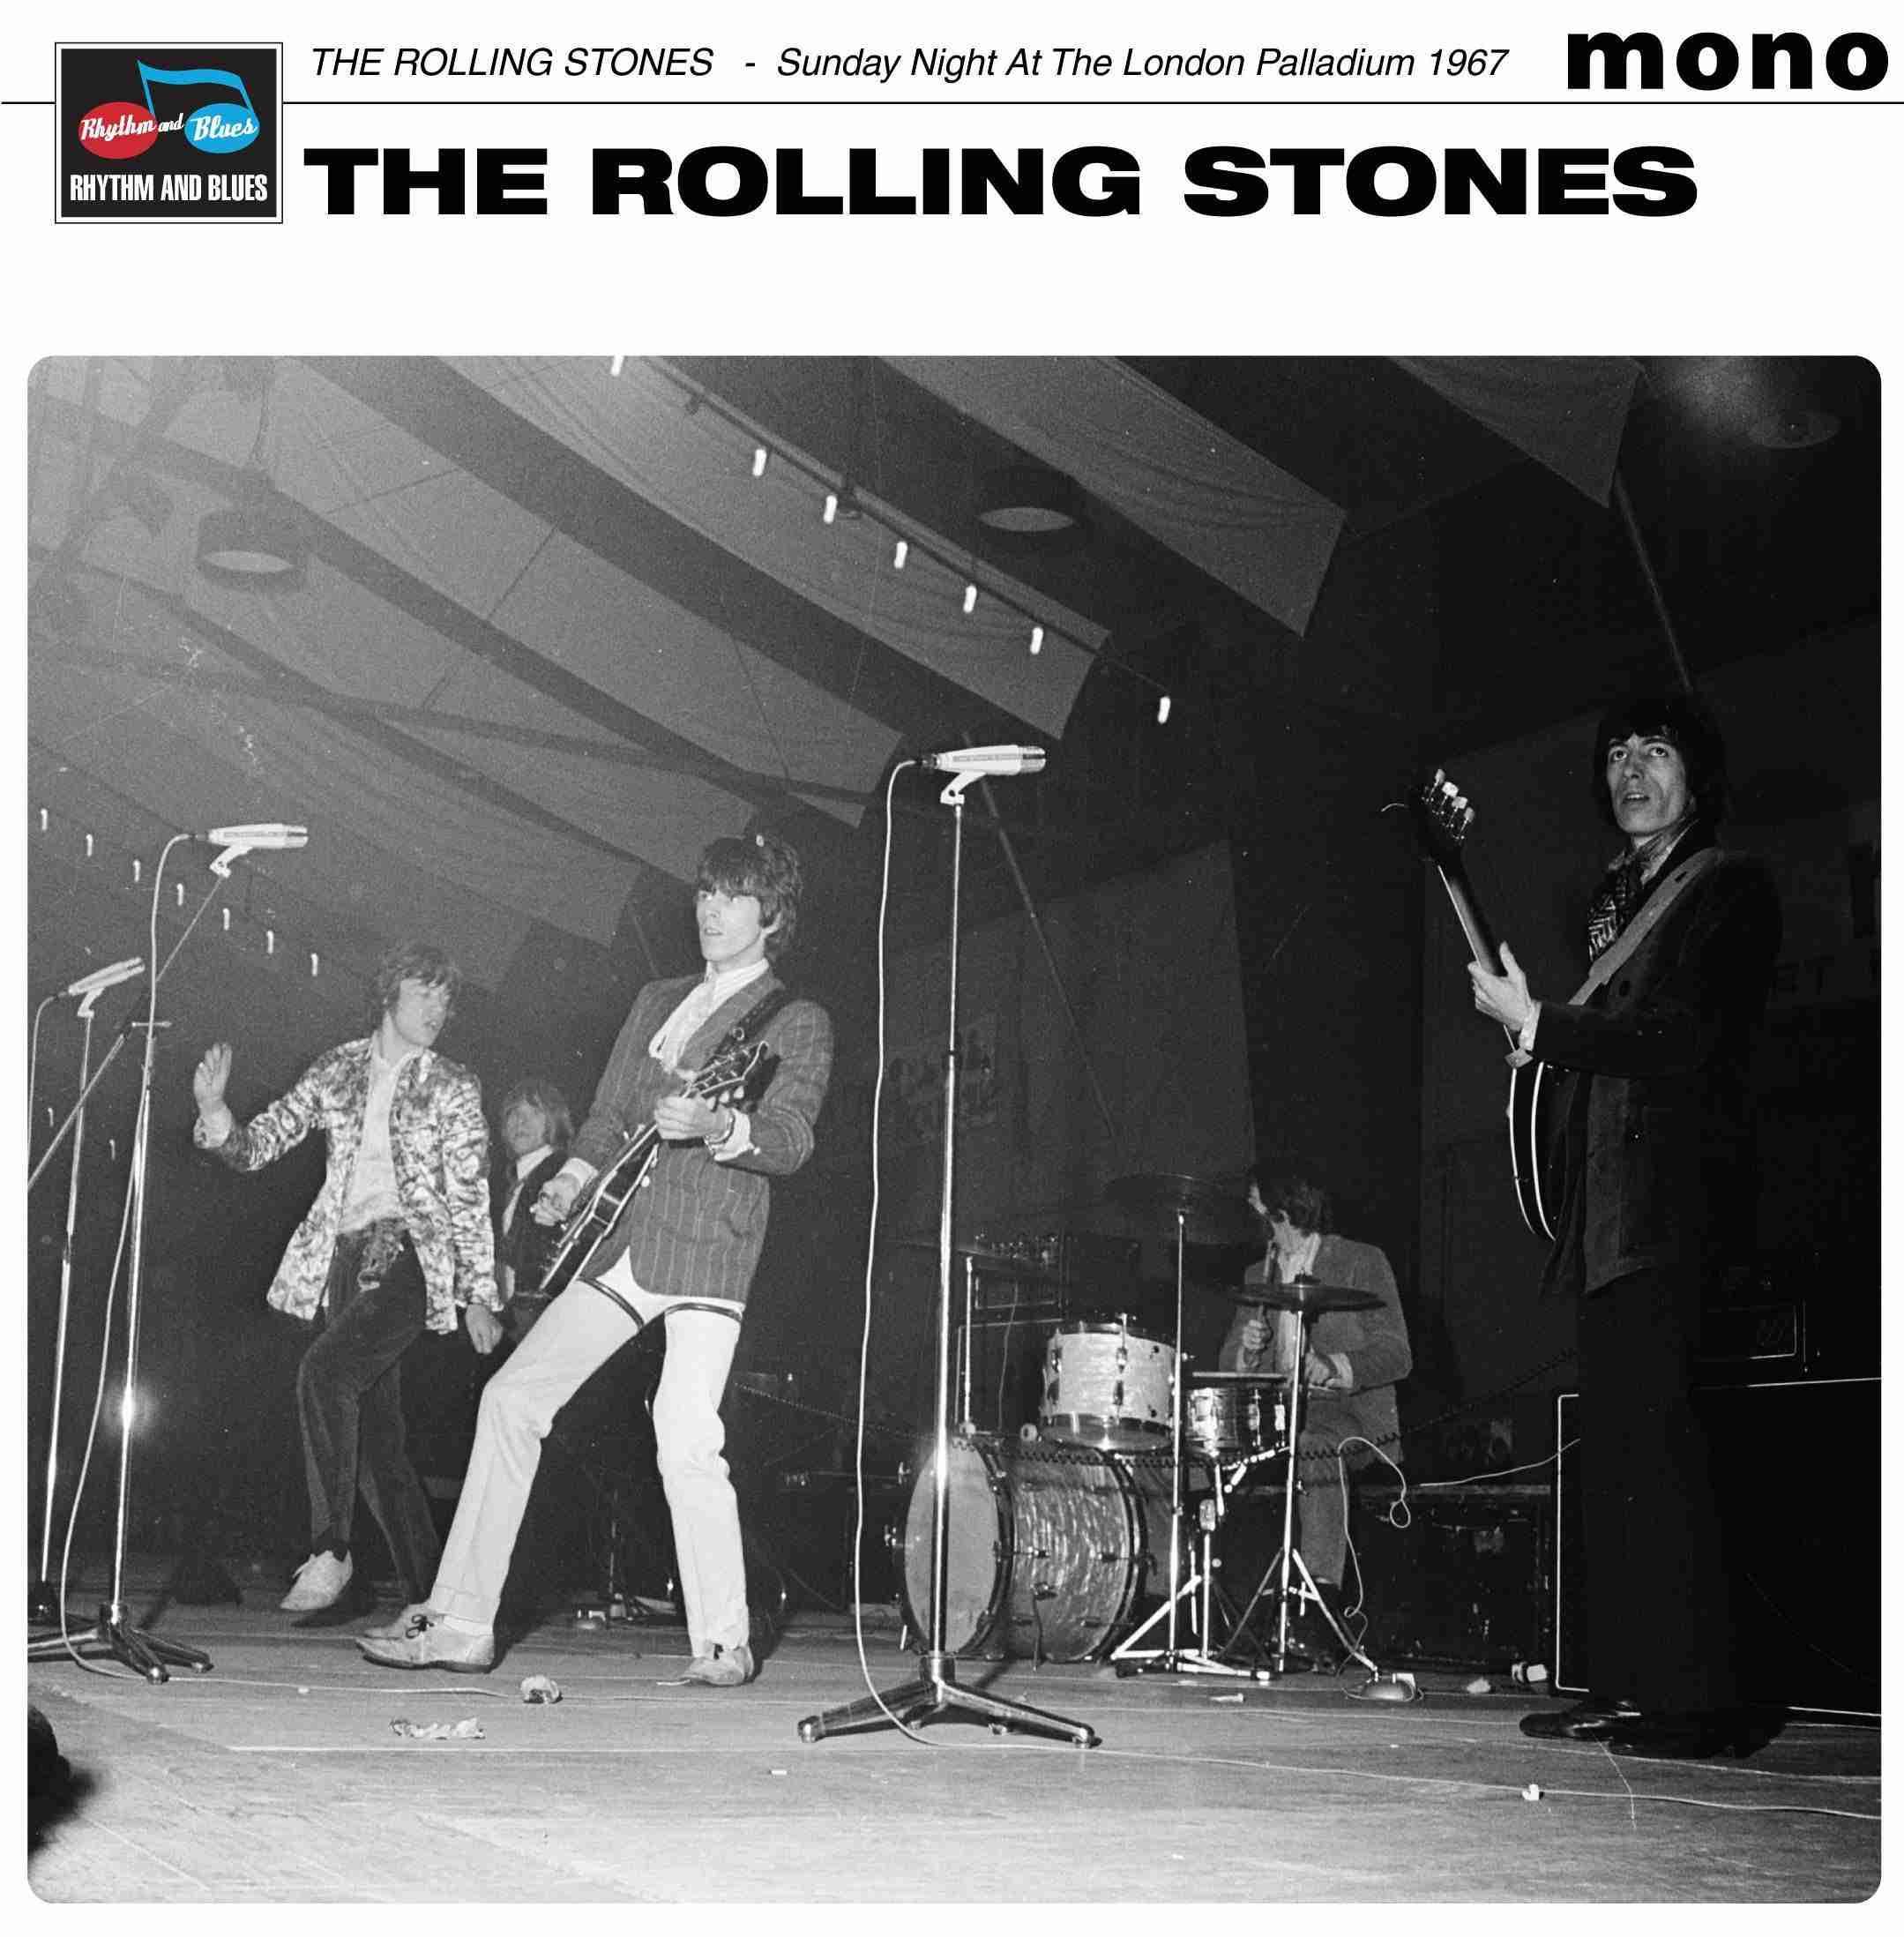 Stones London Palladium